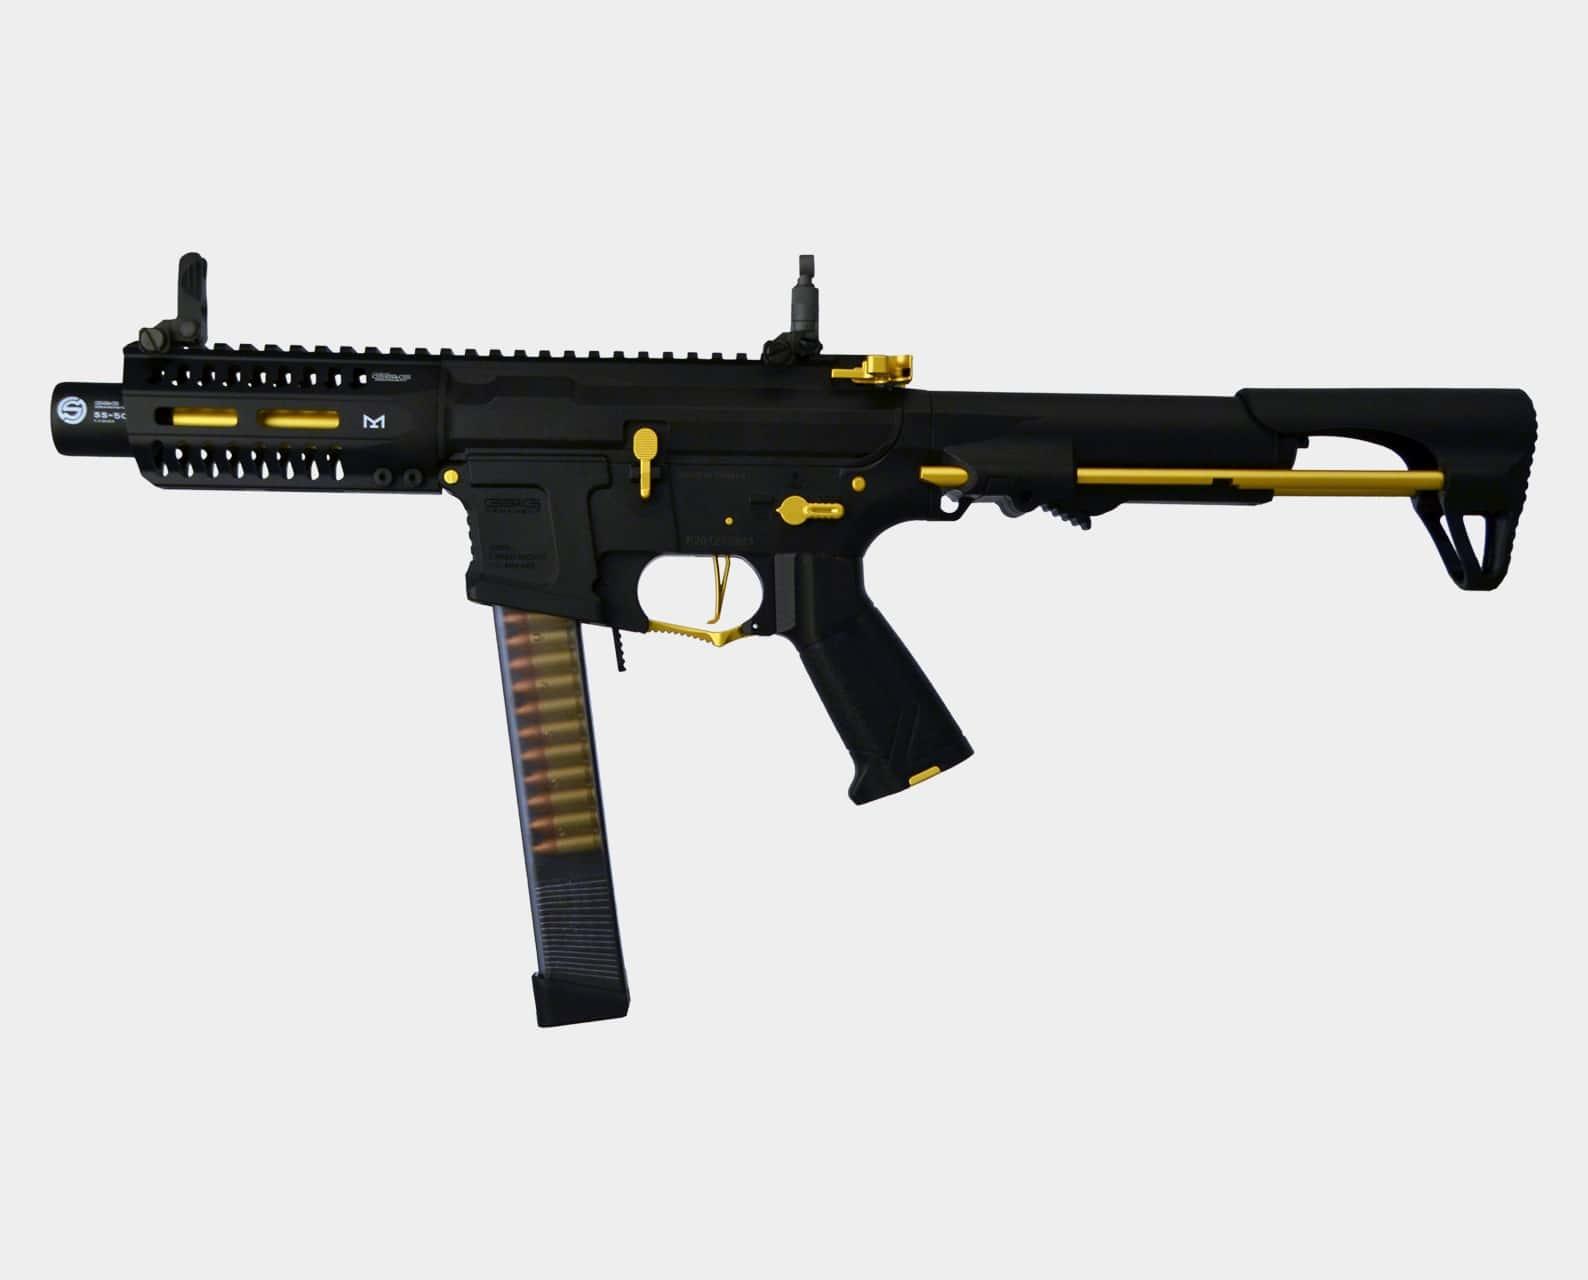 G&G Armament ARP9-Gold Stealth